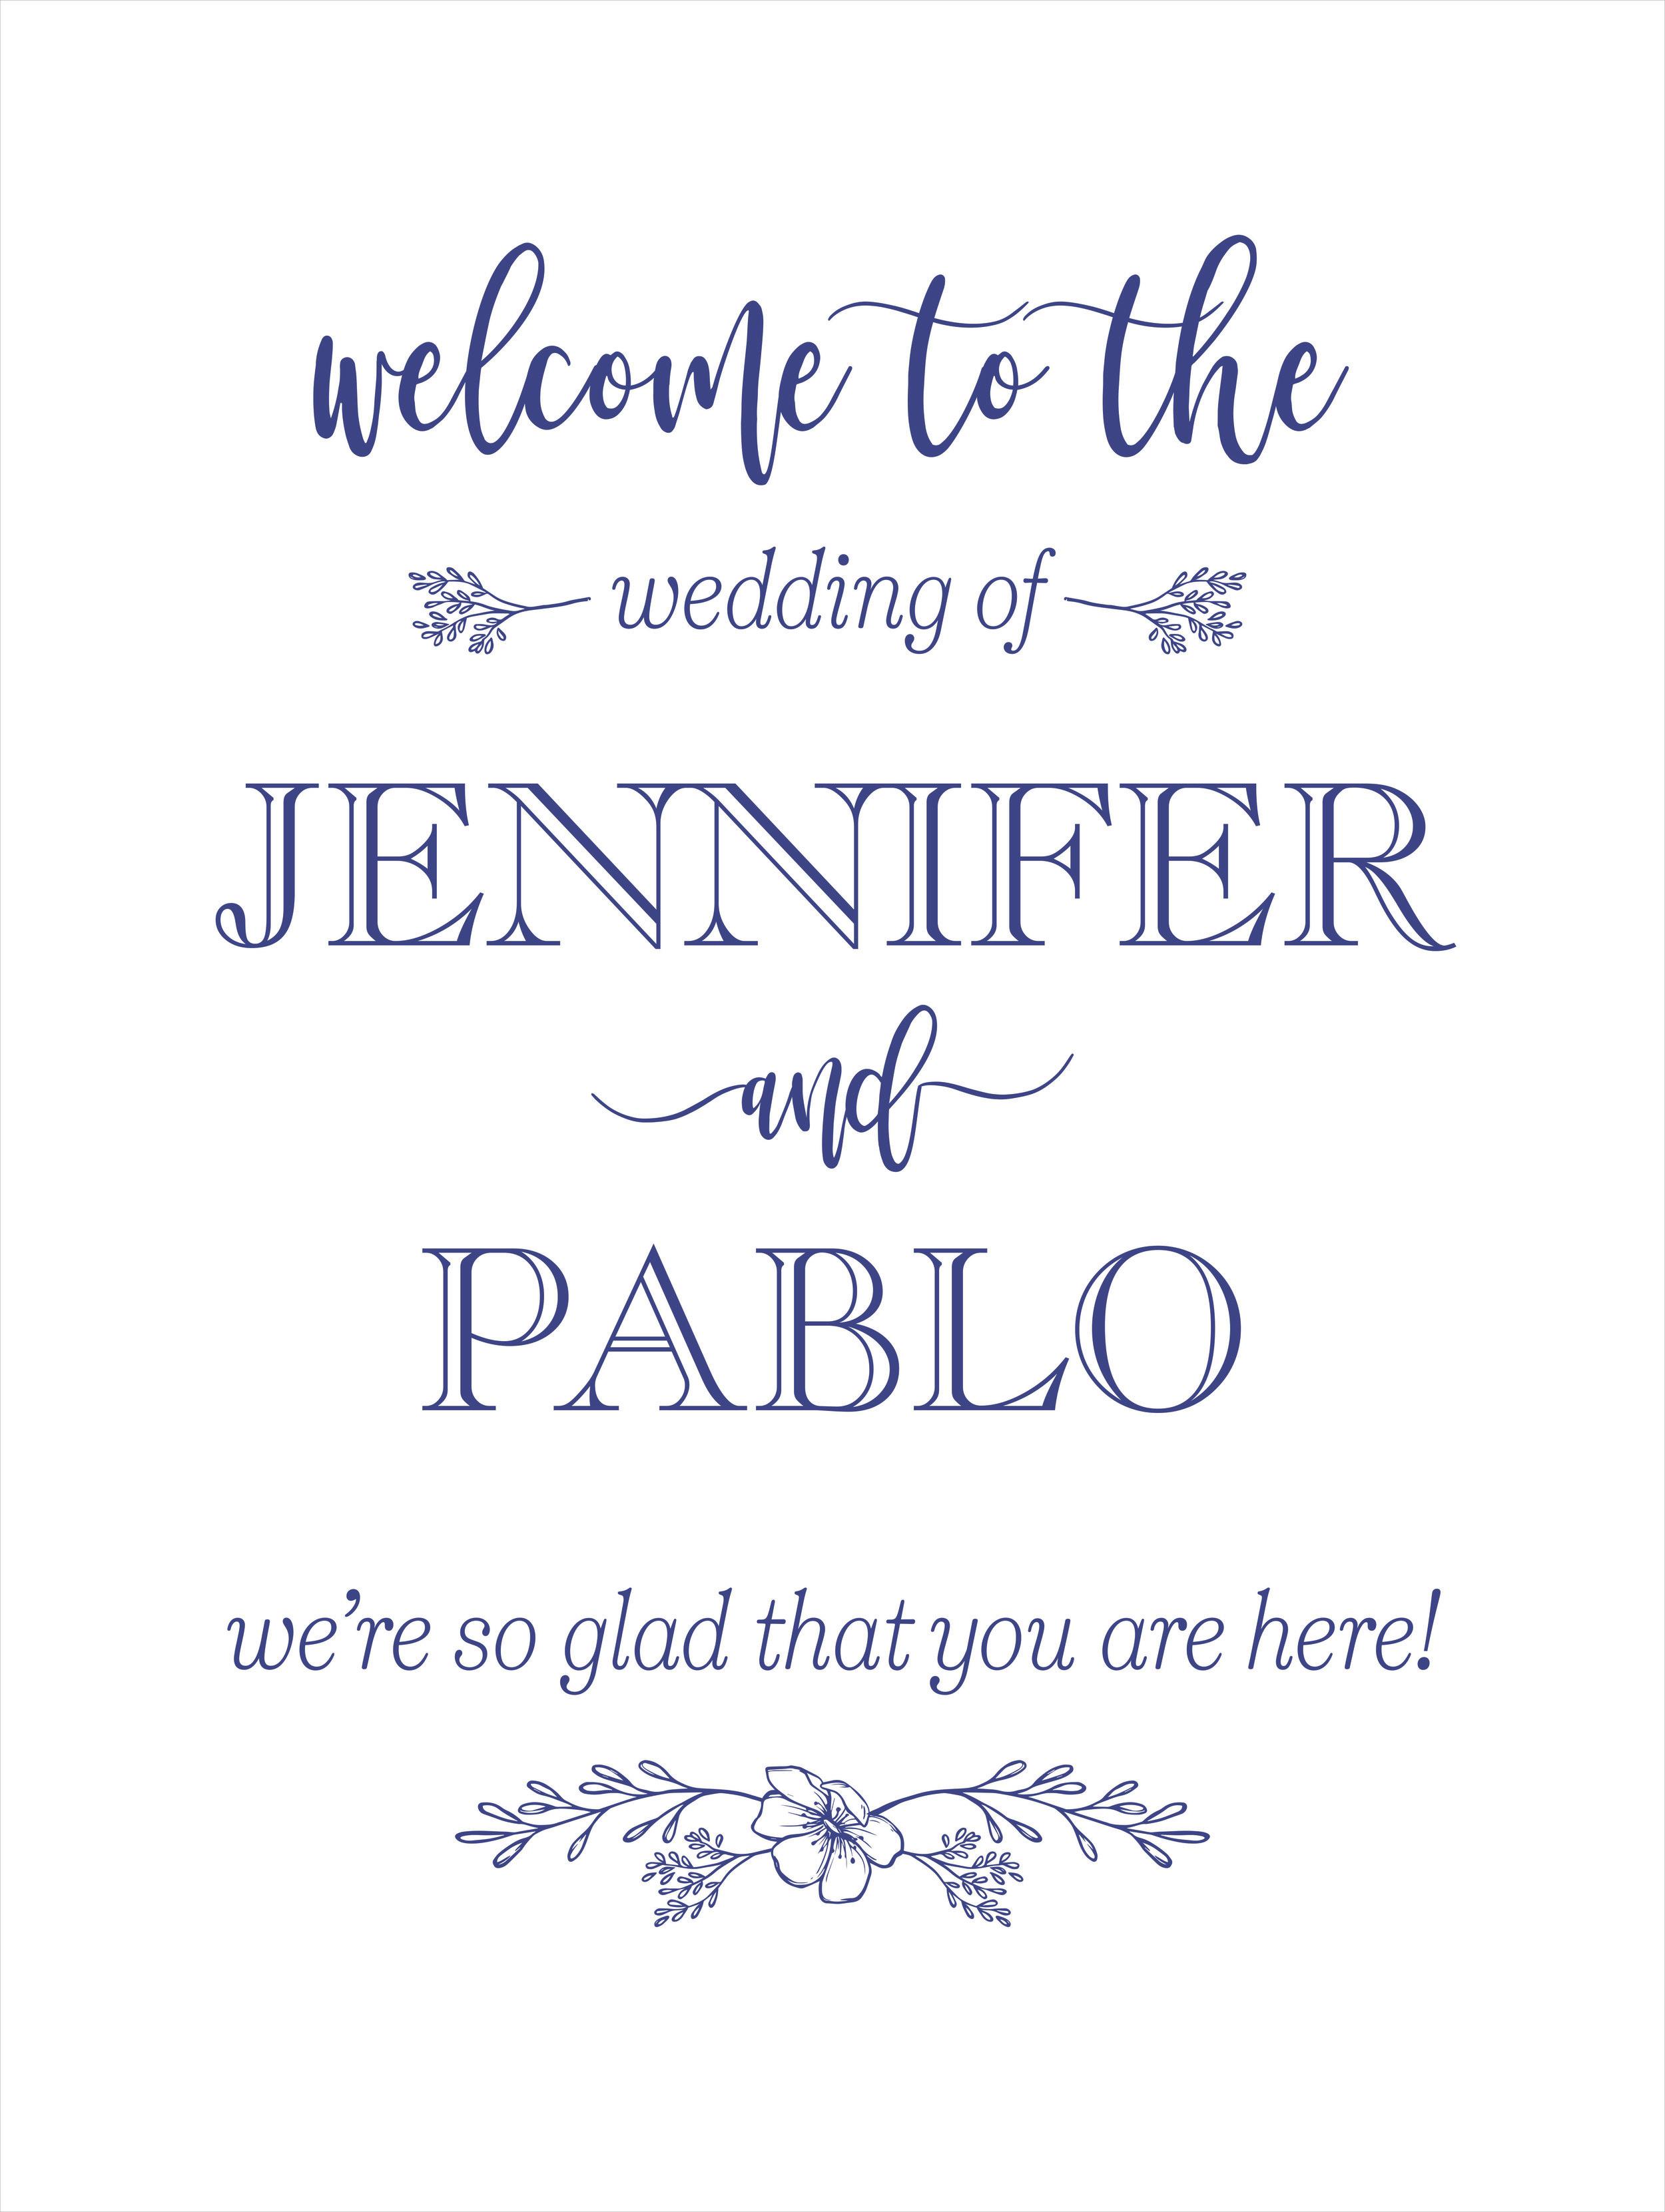 WEDDING WELCOME SIGN.jpg